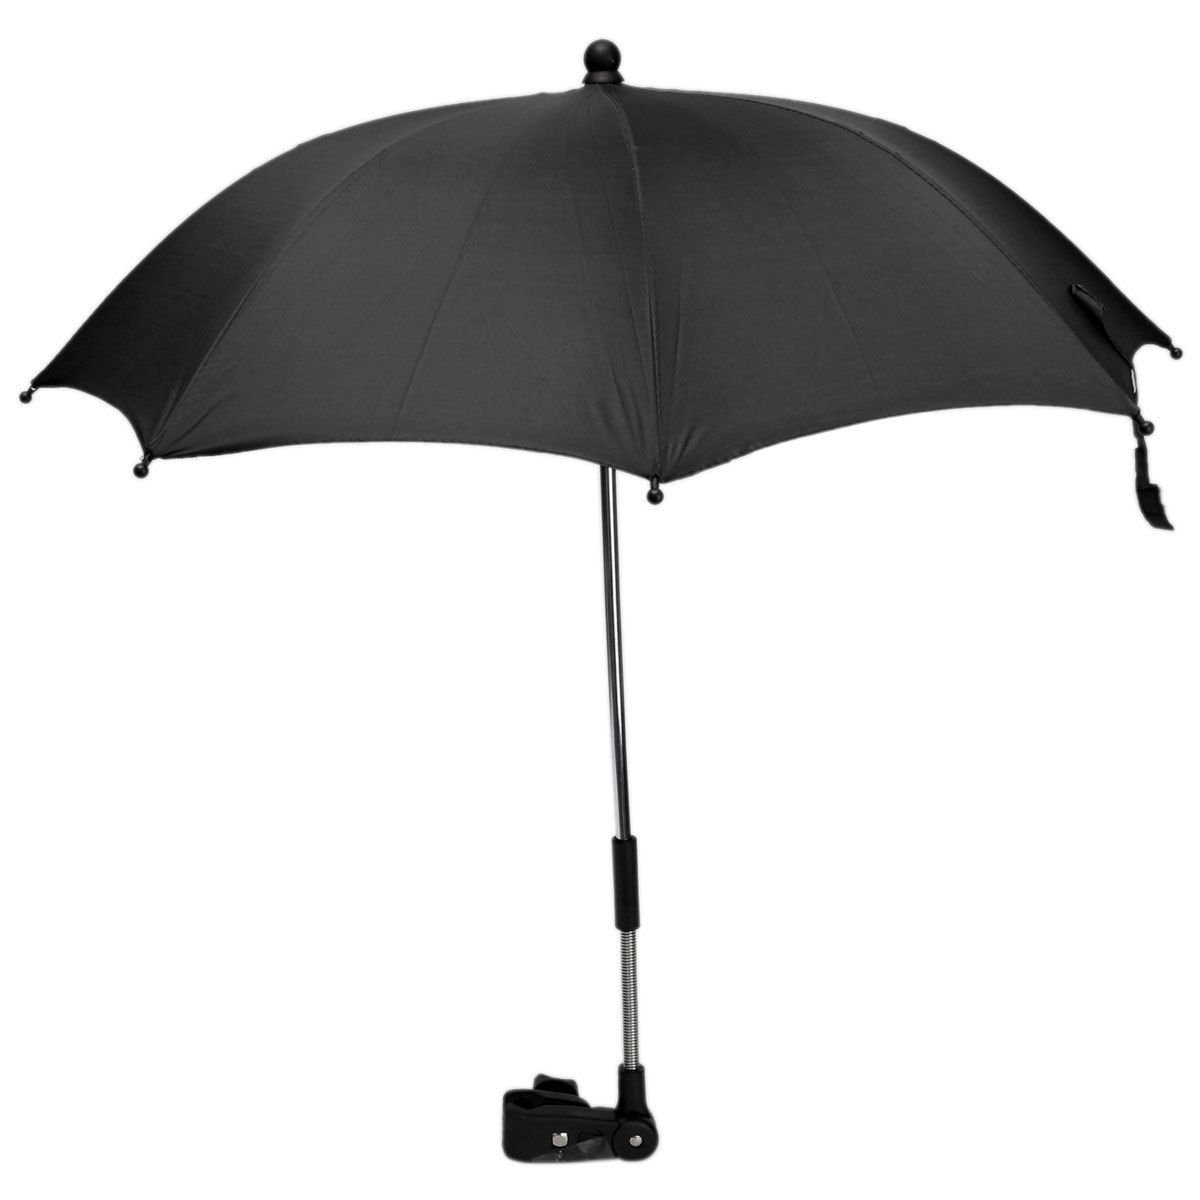 Pushchair Baby Stroller Umbrella and Holder UV Rays Rain Sun Canopy for Any Pram Pushchair Stroller Buggies - Adjustable Direction Babies and Infants Protect Accessories Yosoo yosoo-uk518bbsun